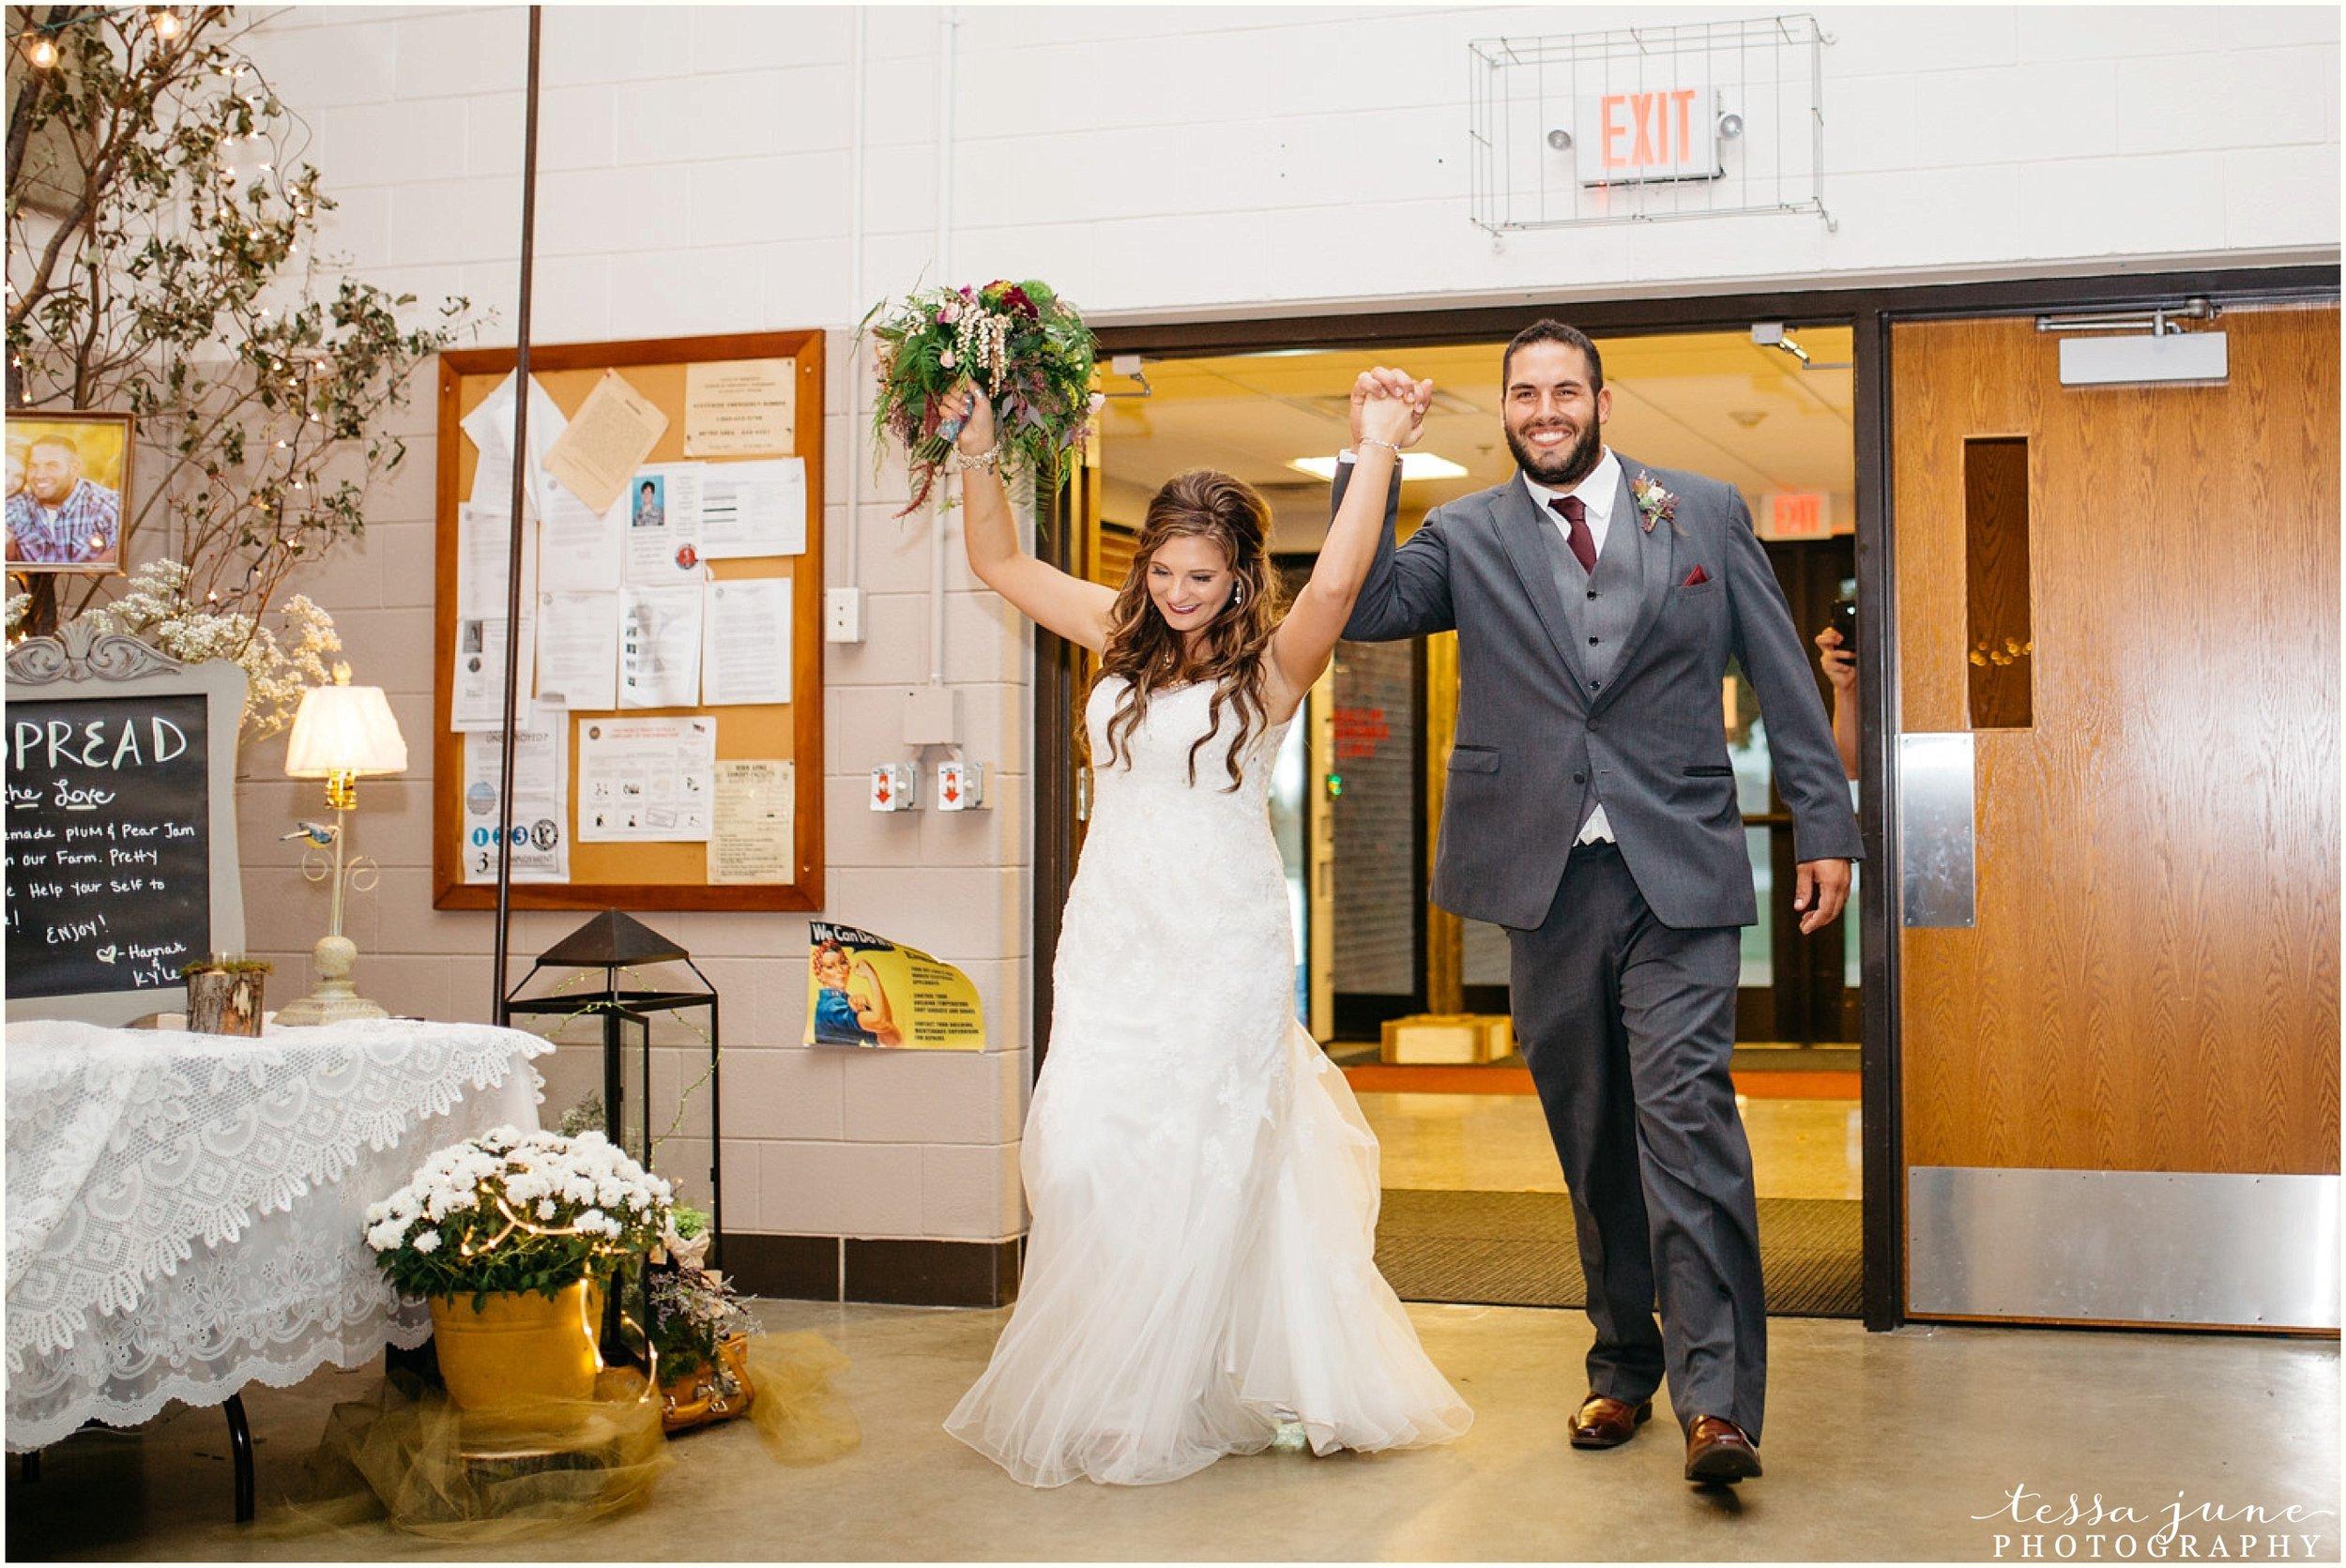 bohemian-minnesota-wedding-mismatched-bridesmaid-dresses-waterfall-st-cloud-tessa-june-photography-155.jpg